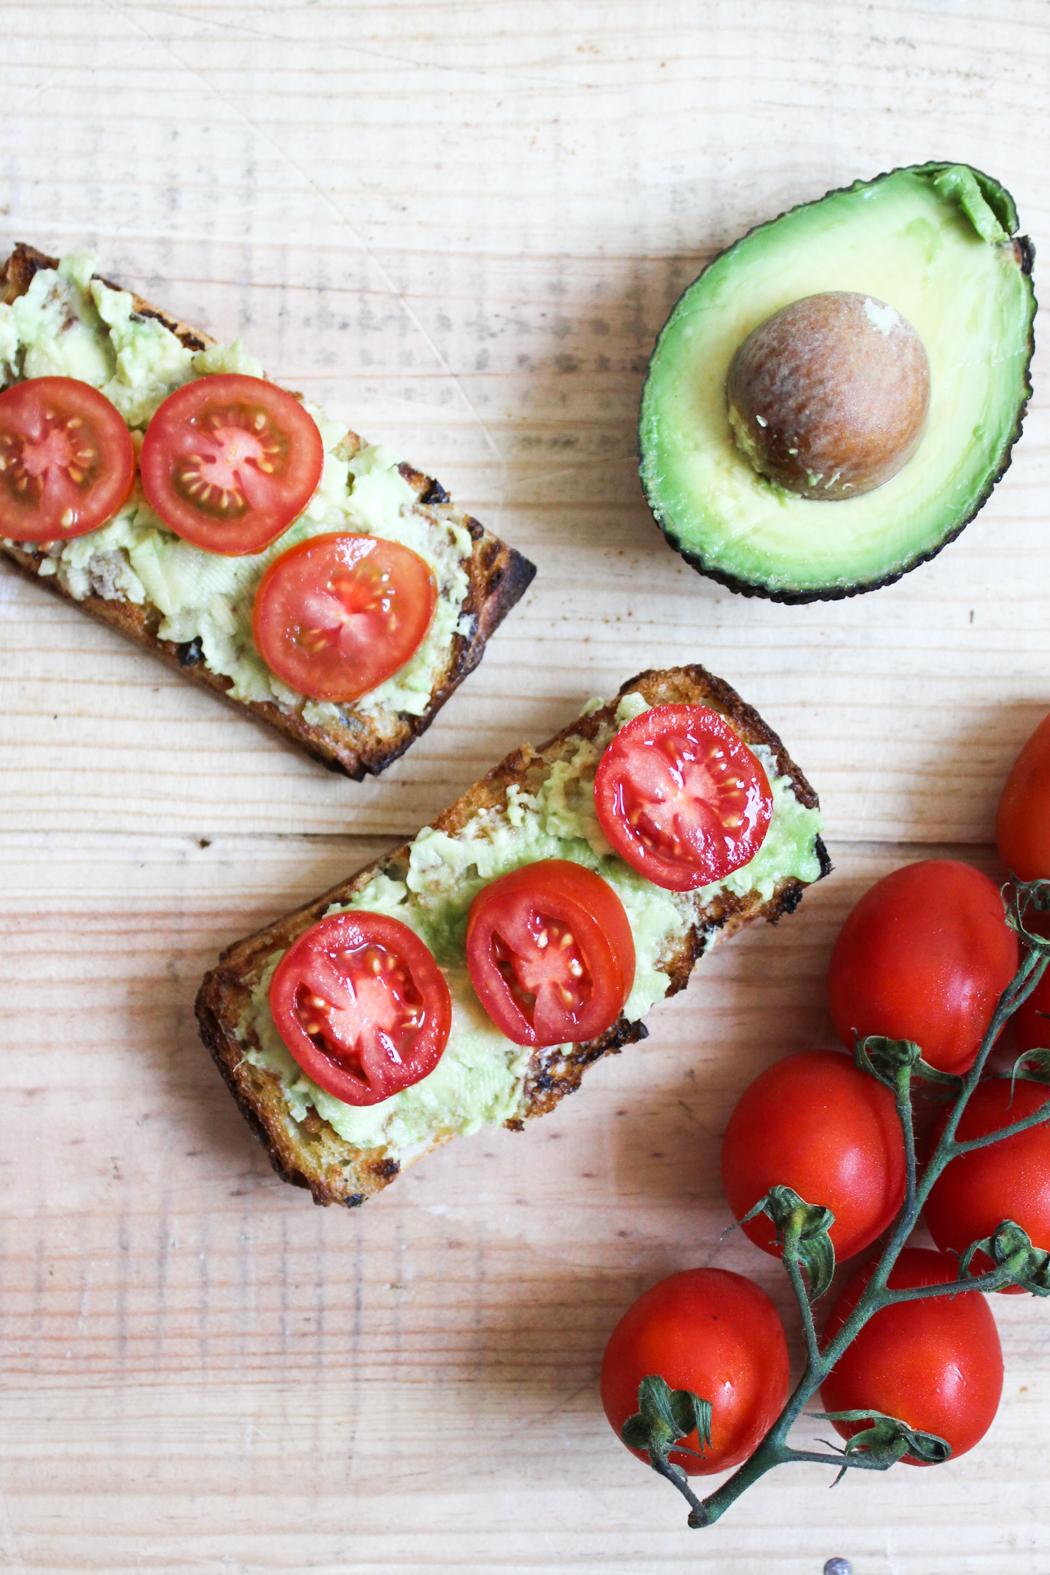 Avocadobrot-Foodblogger-Lindarella-München-Tomatenbrot-Vegan-Rezept-1